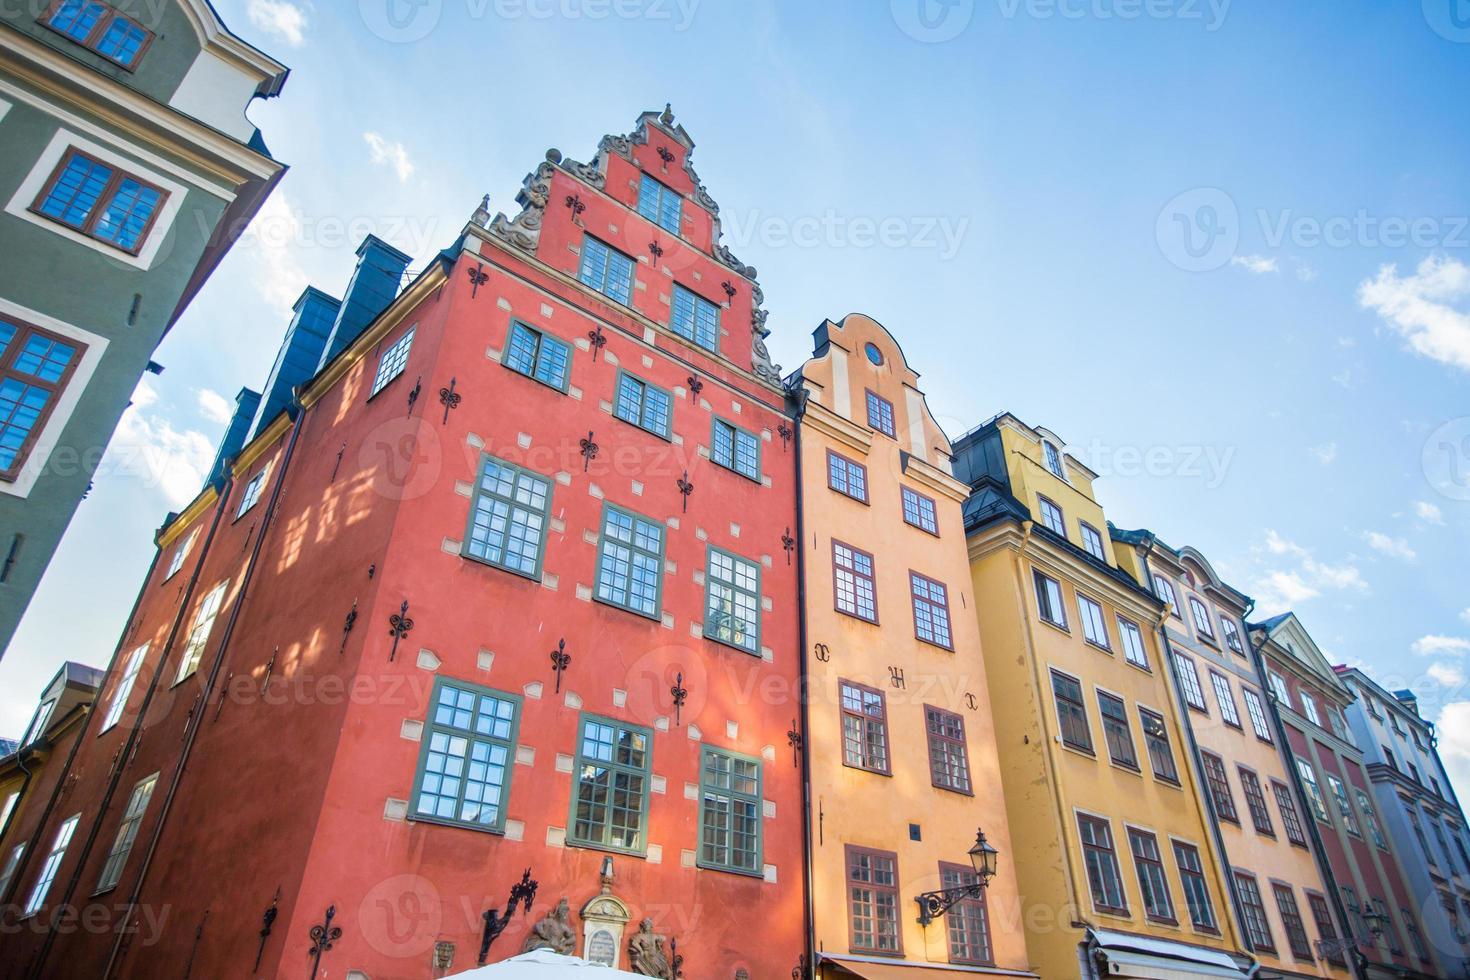 färgglada hus i stockholms gamla stad foto